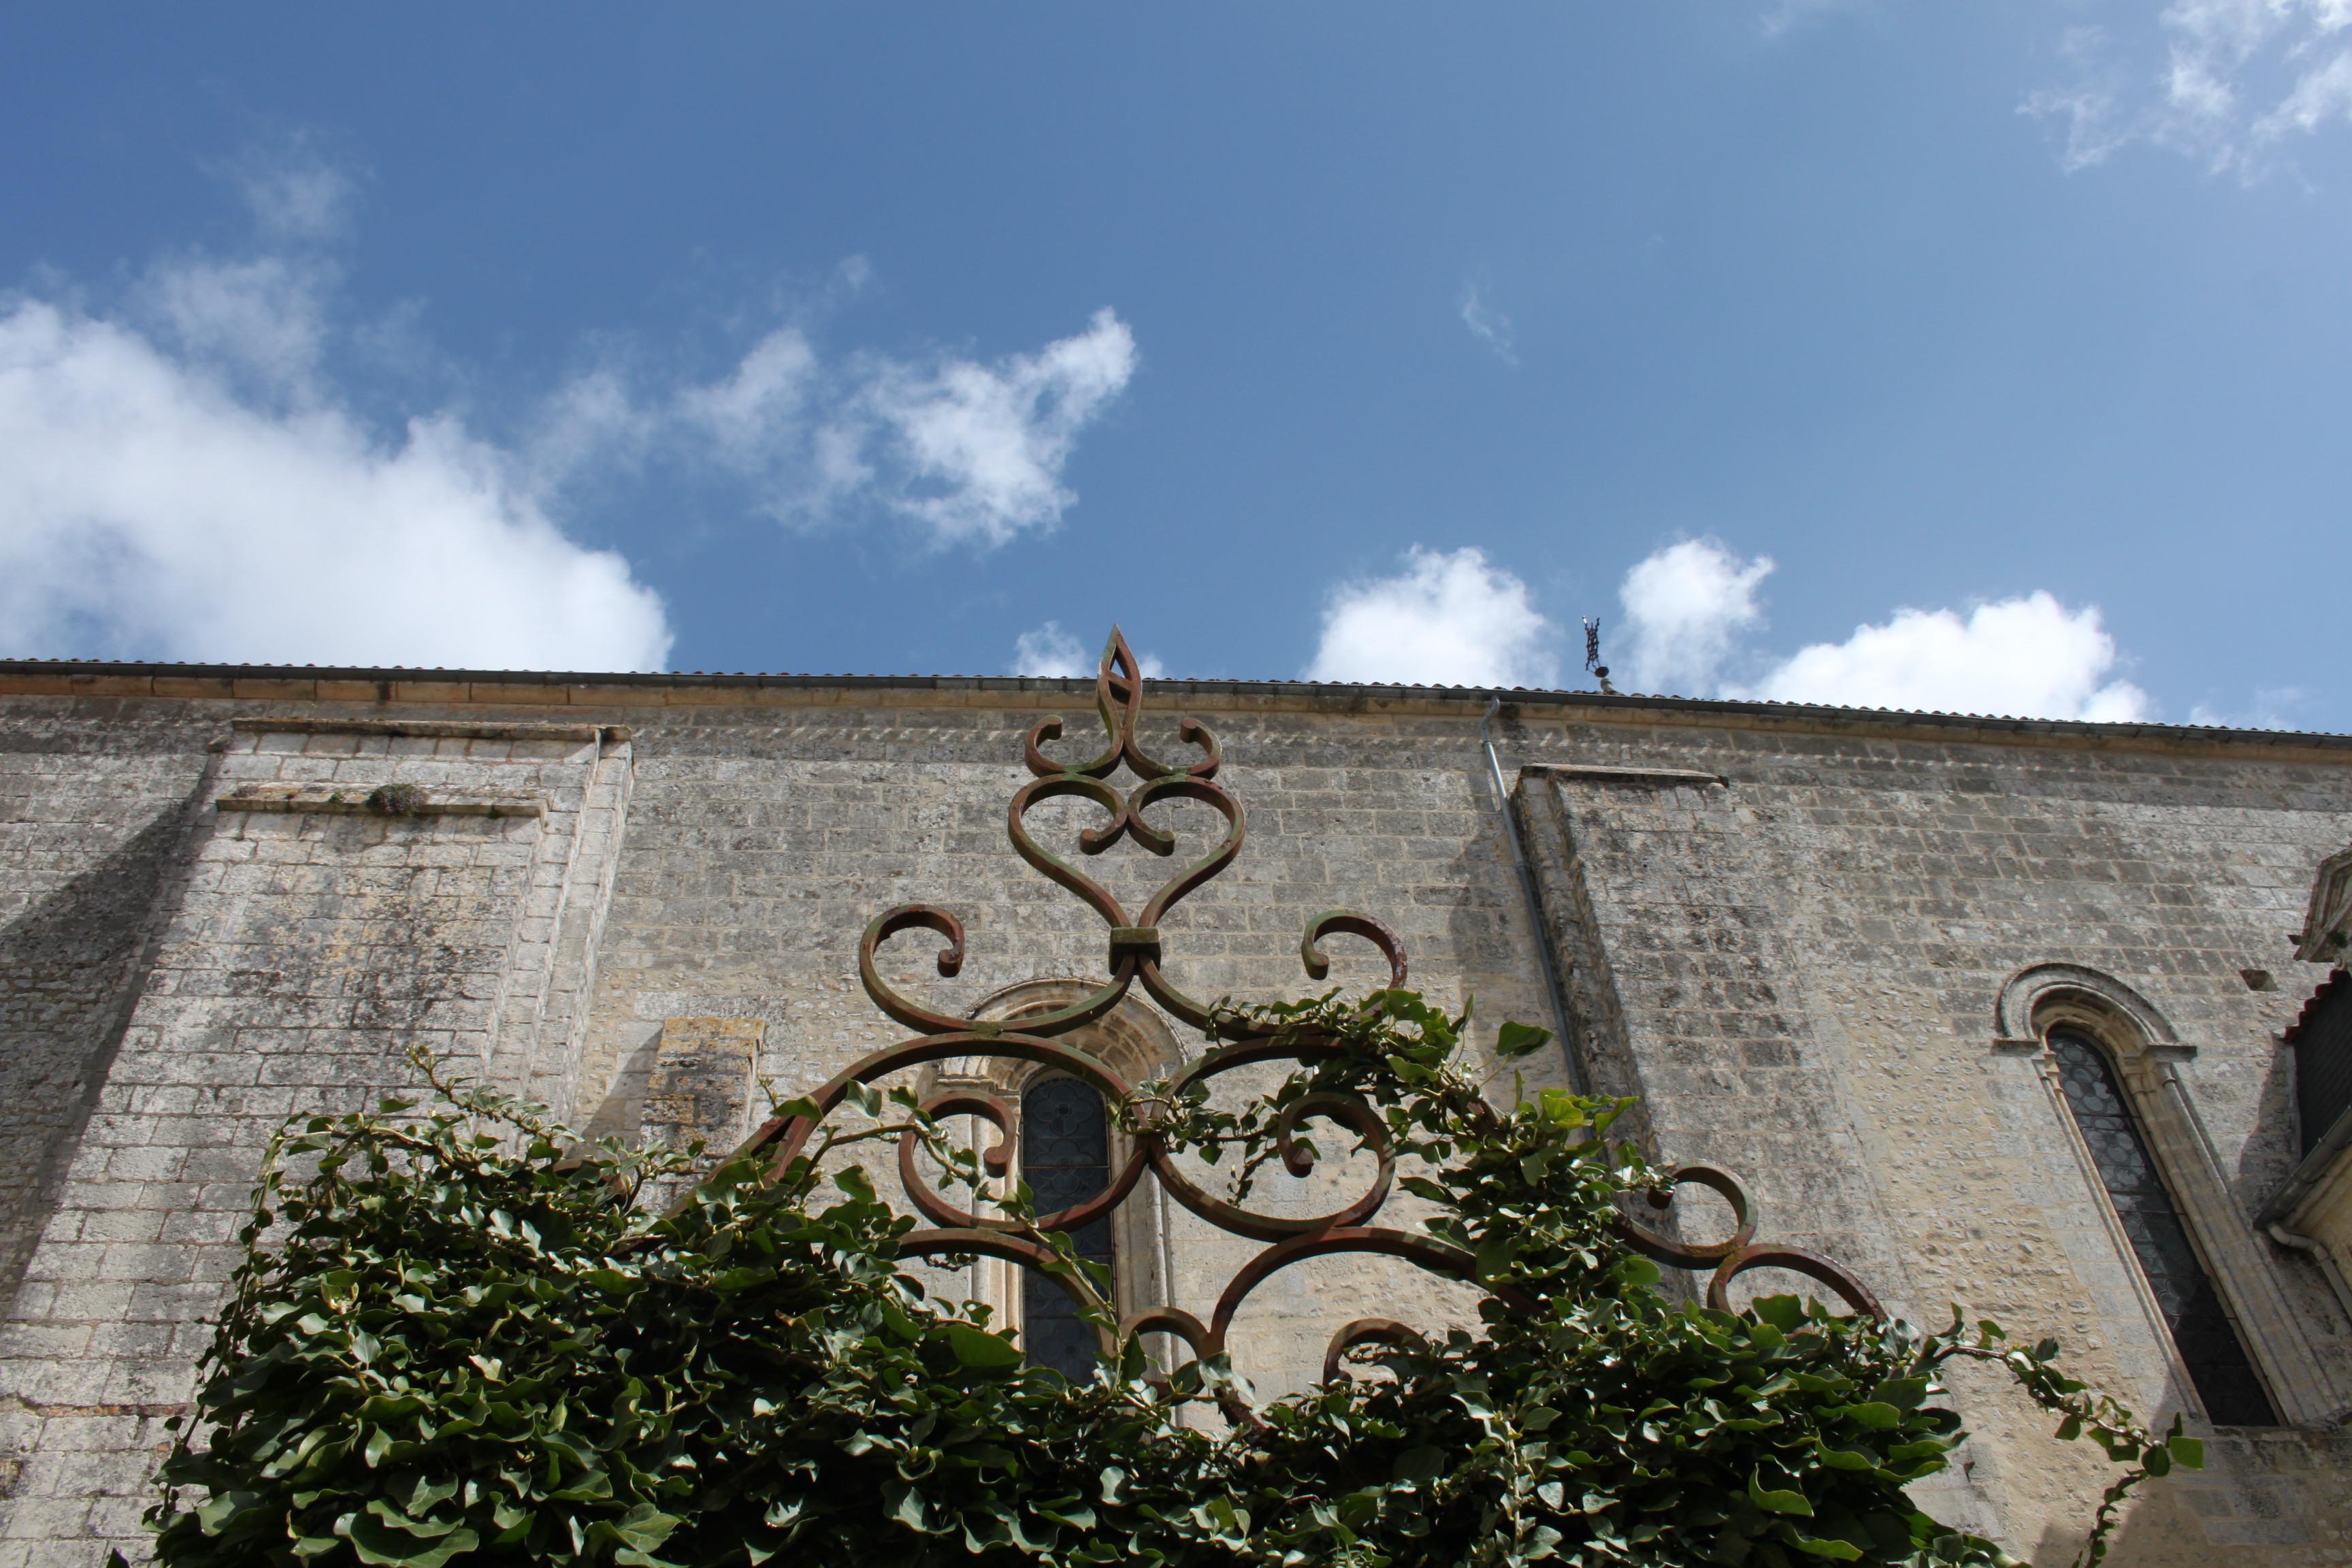 abbaye de bassac en bateau charente en croisiere inter croisieres sireuil nicols.jpg